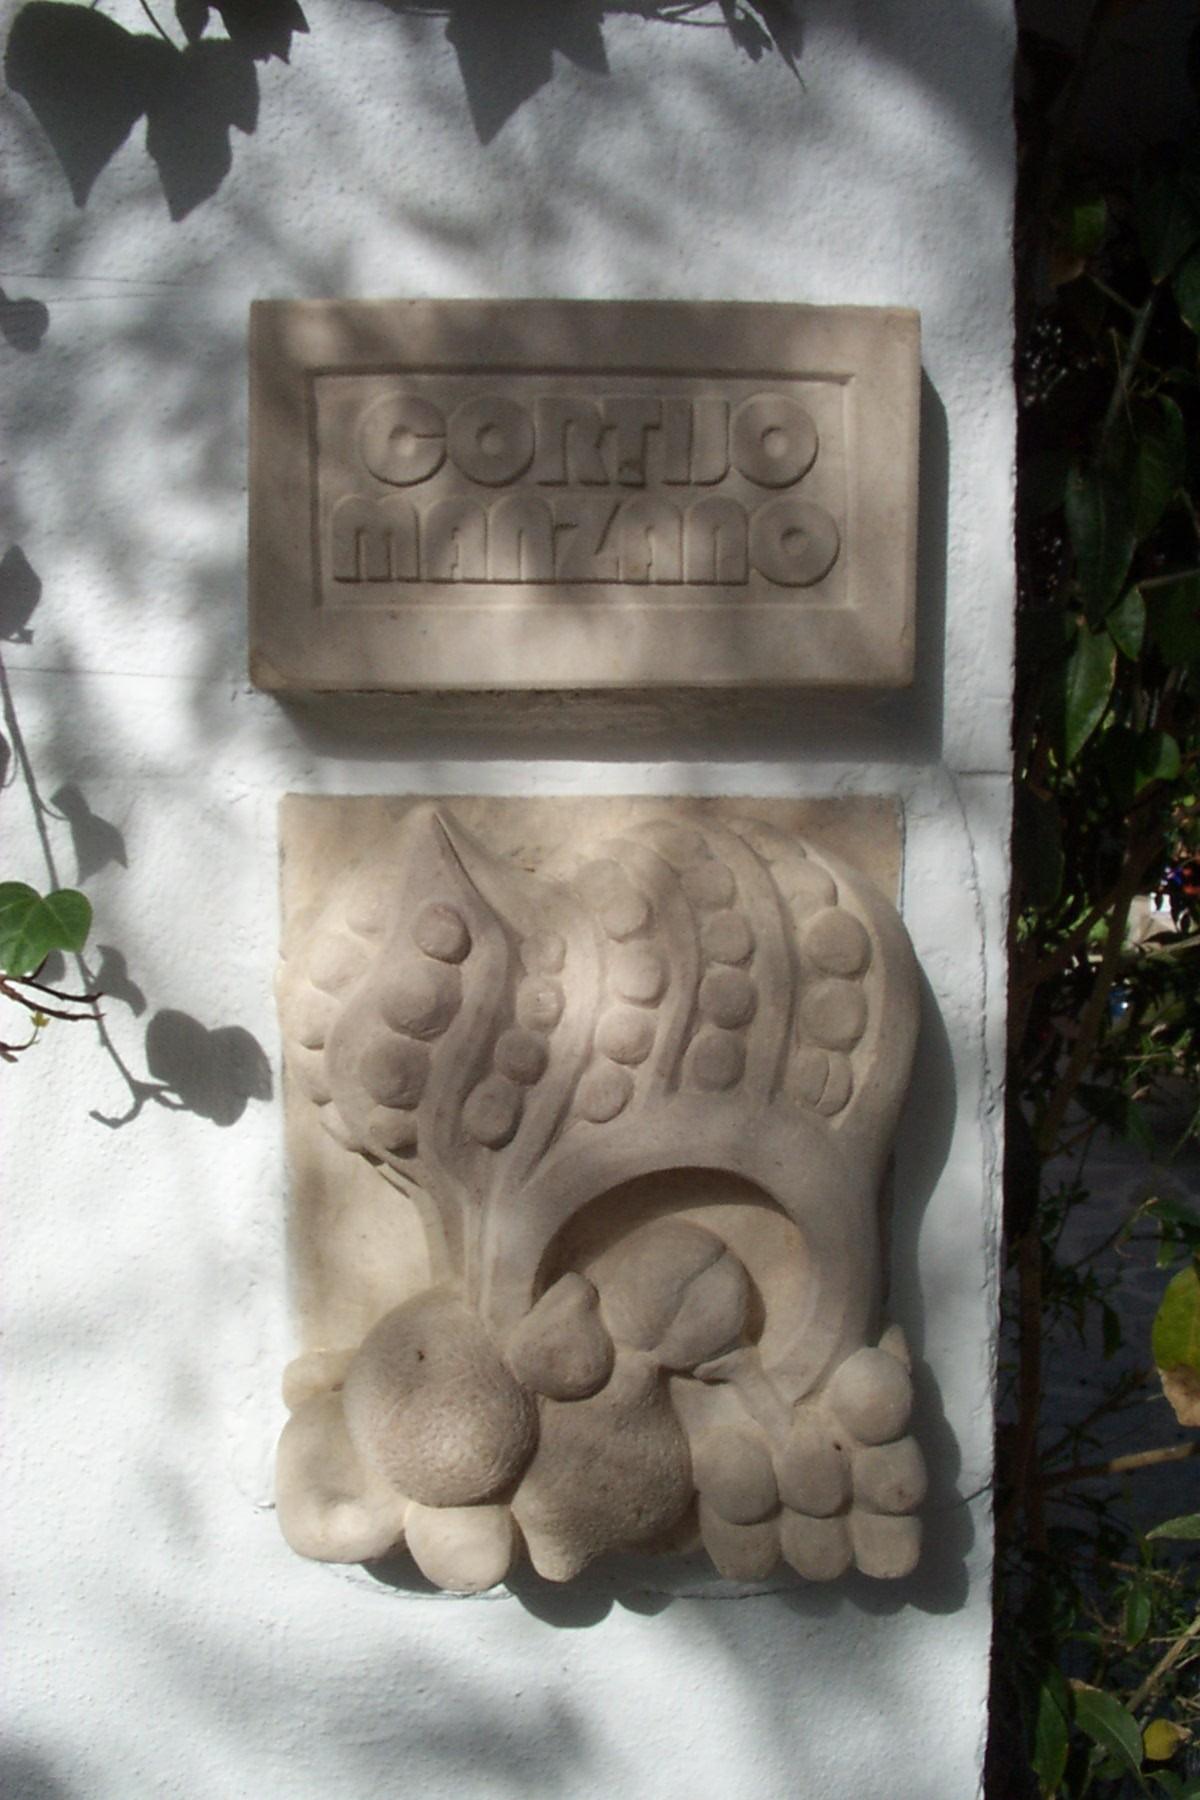 Jeff Perks-Cortijo Manzano (Stone)50x30cm